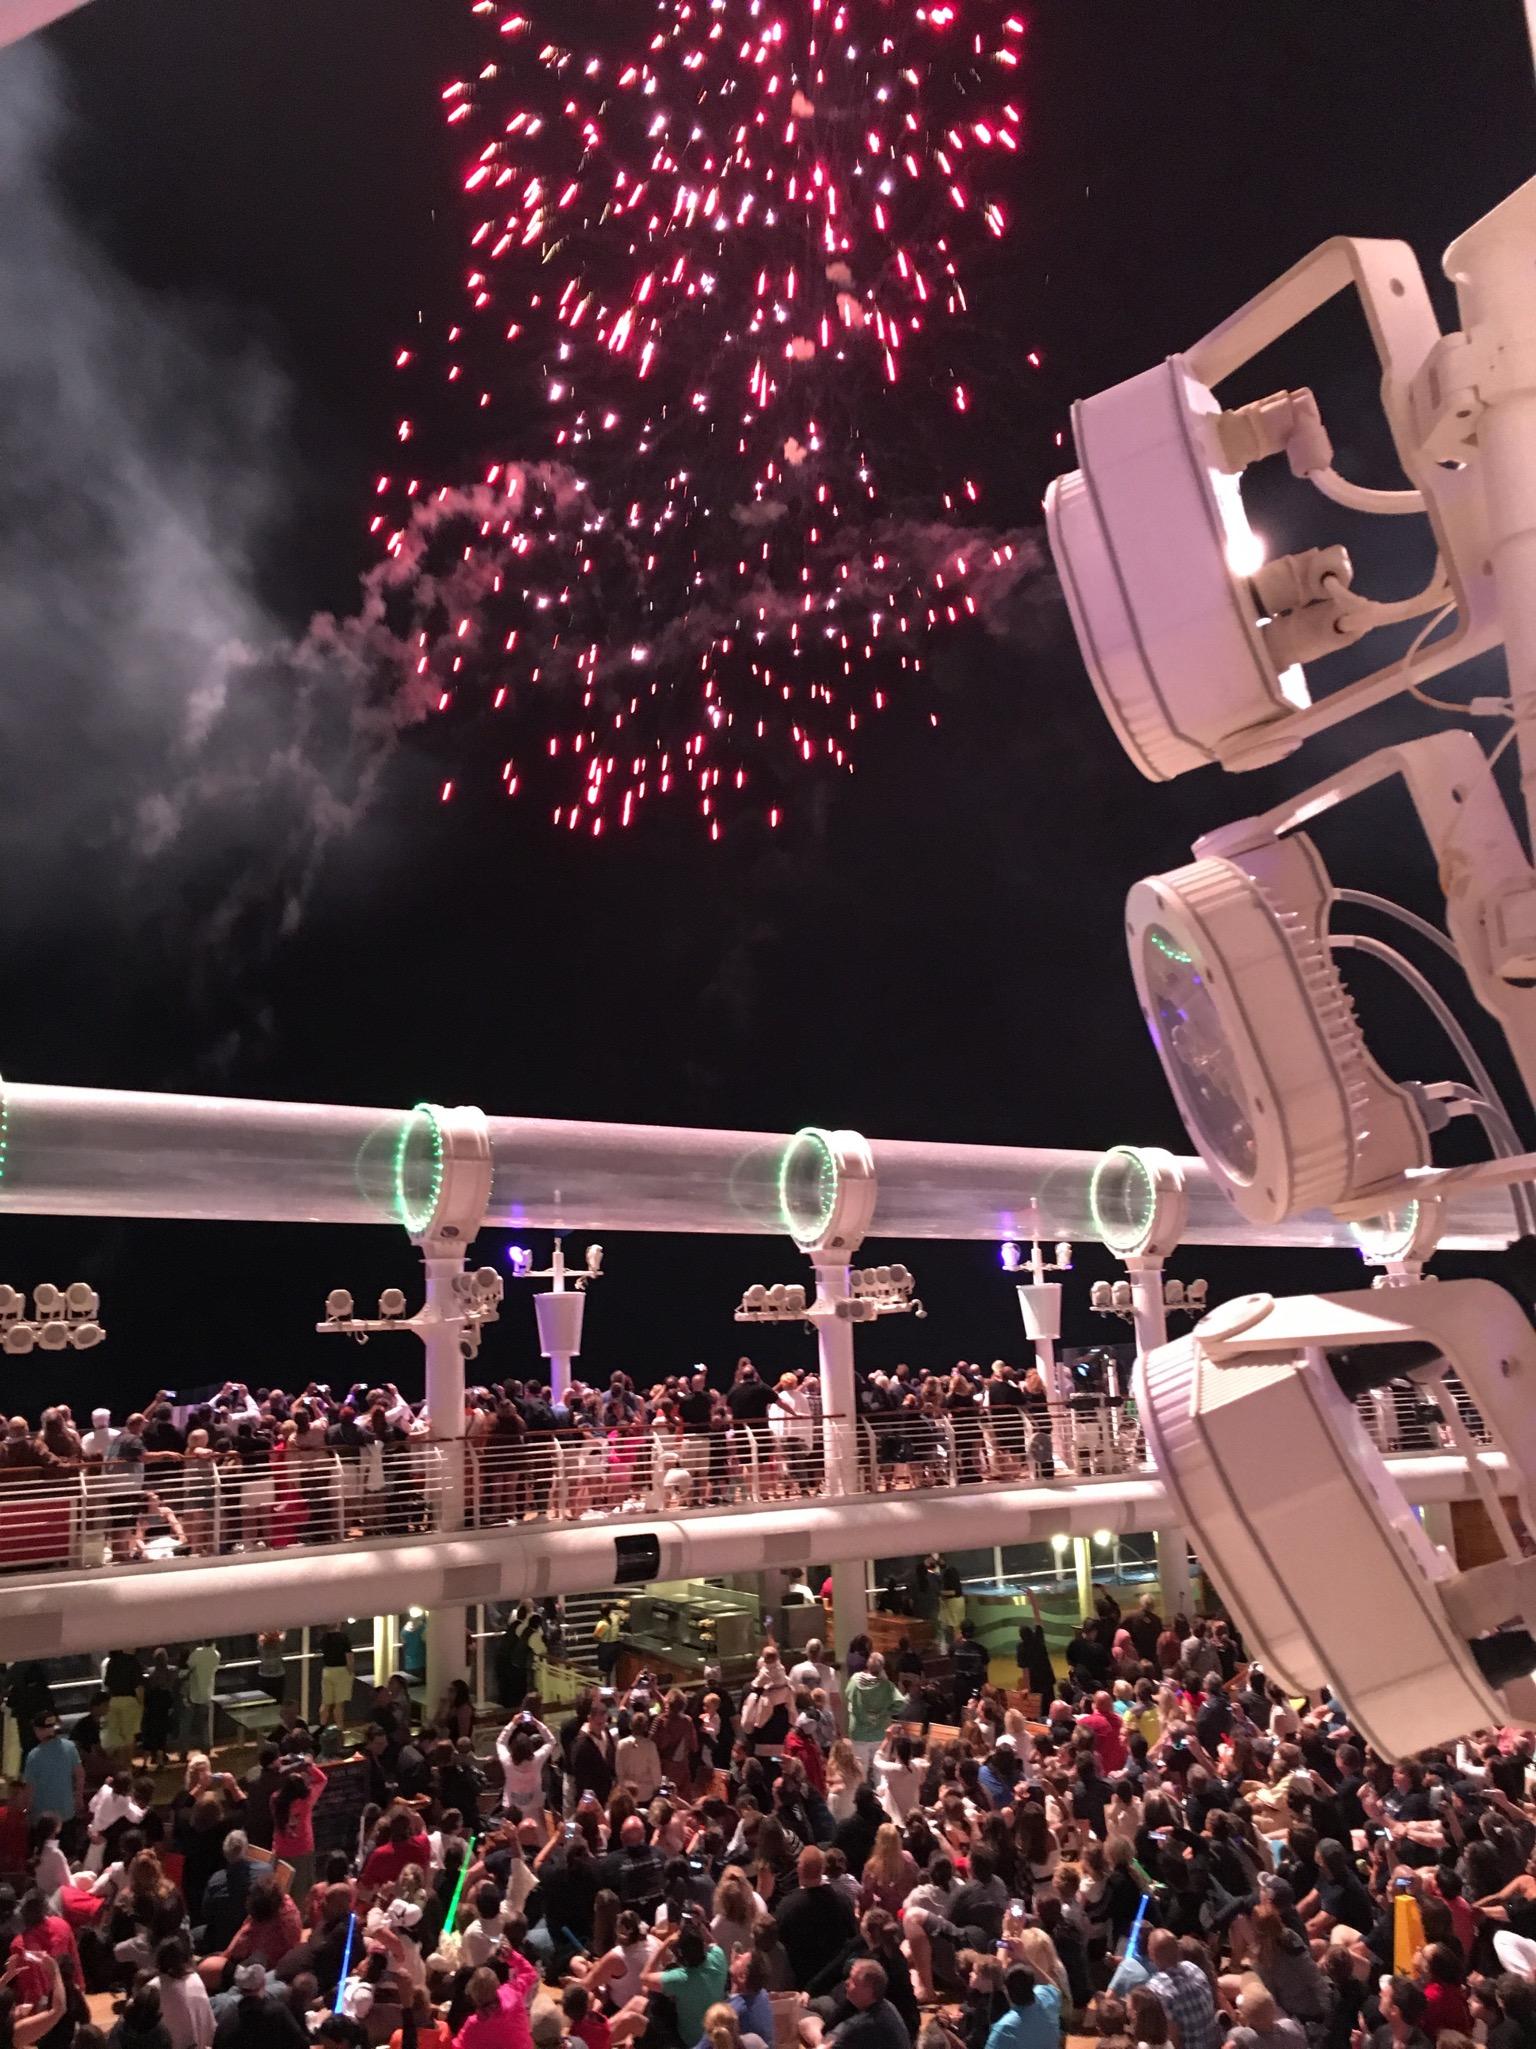 Fireworks Star Wars Day